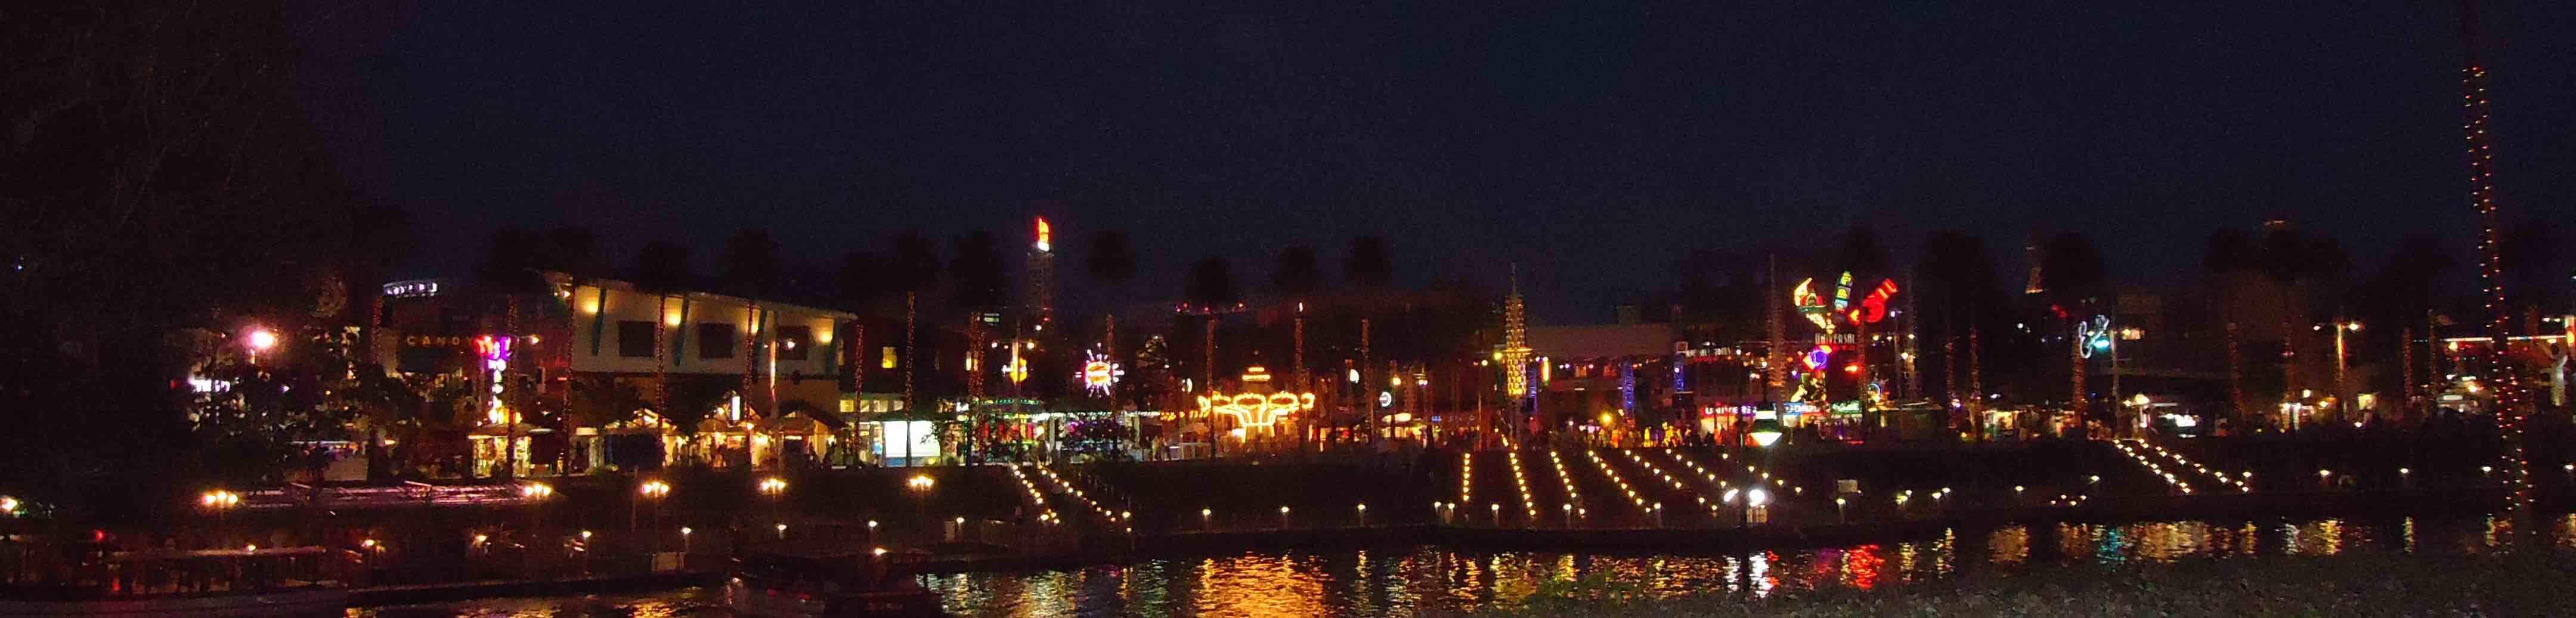 Universal Studios Floride